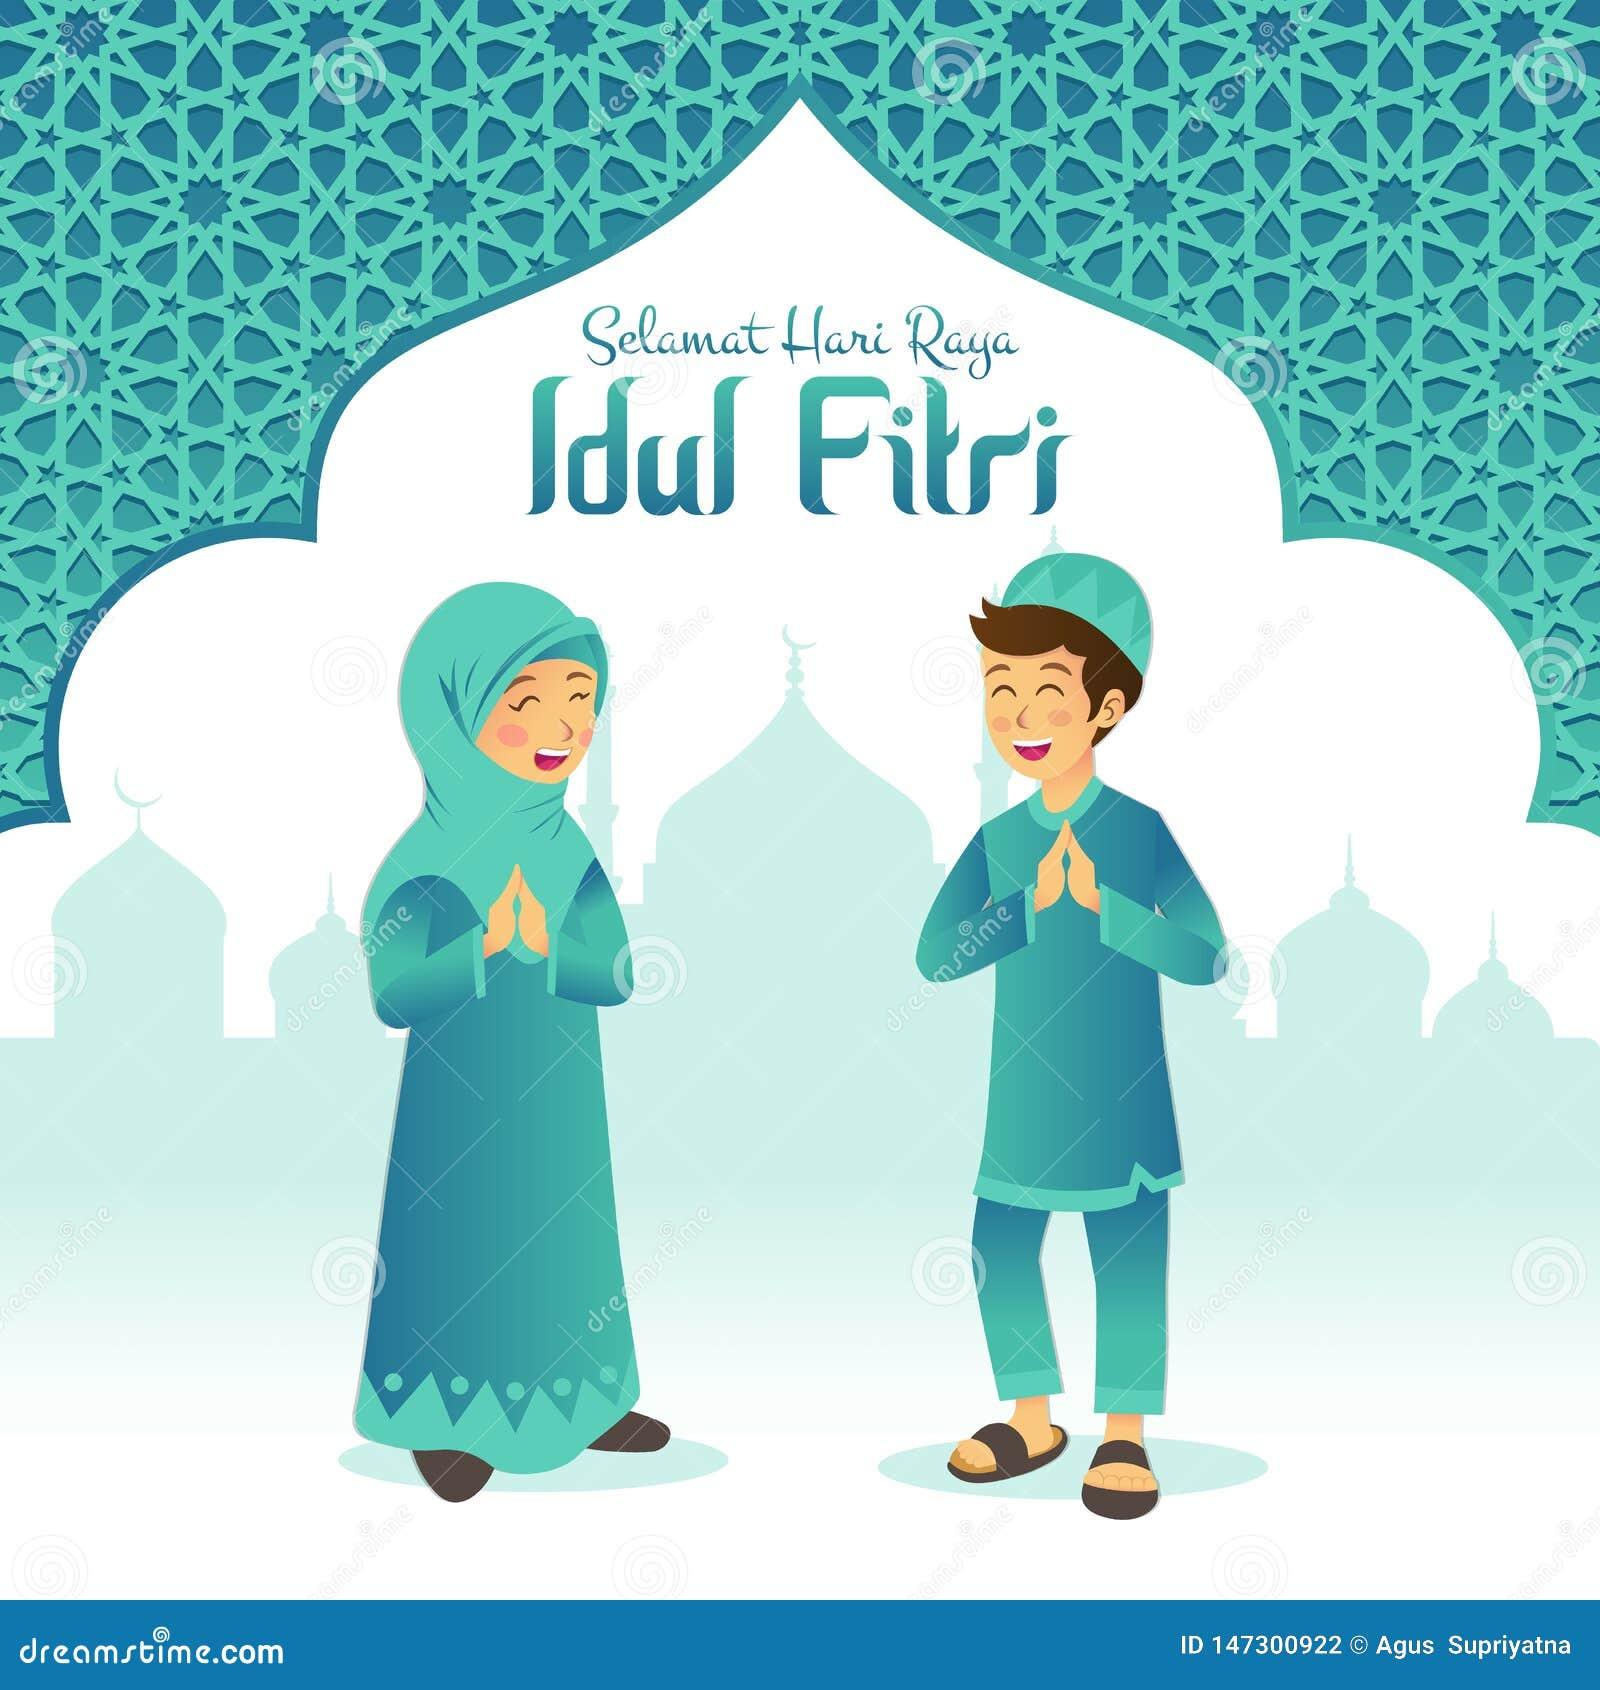 Selamat hari raya Idul Fitri是愉快的eid穆巴拉克另一种语言在印度尼西亚语的 庆祝Eid Al fitr w的动画片回教孩子